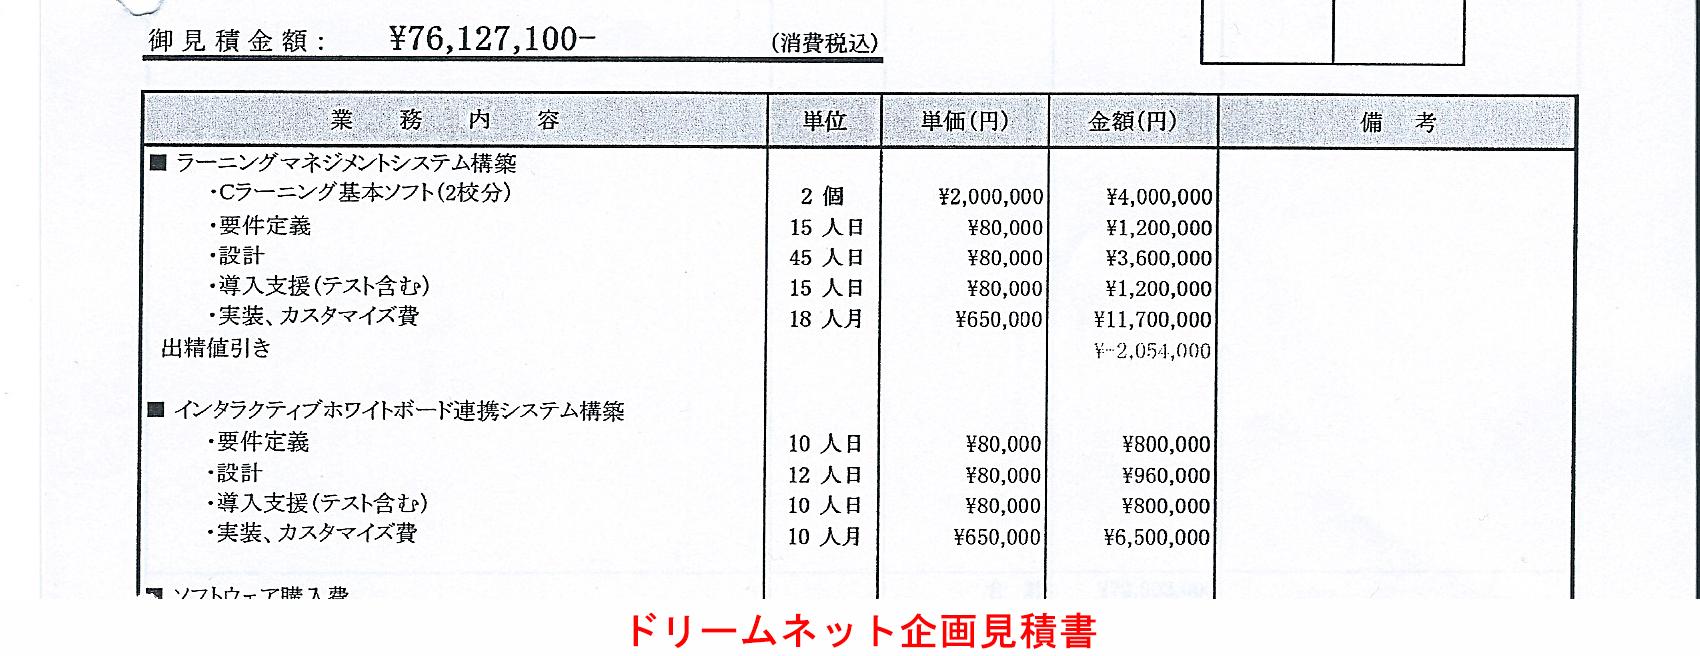 http://hunter-investigate.jp/news/2015/04/22/%E3%83%89%E3%83%AA%E3%83%BC%E3%83%A0%E8%A6%8B%E7%A9%8D%E6%9B%B8%EF%BC%92.jpg